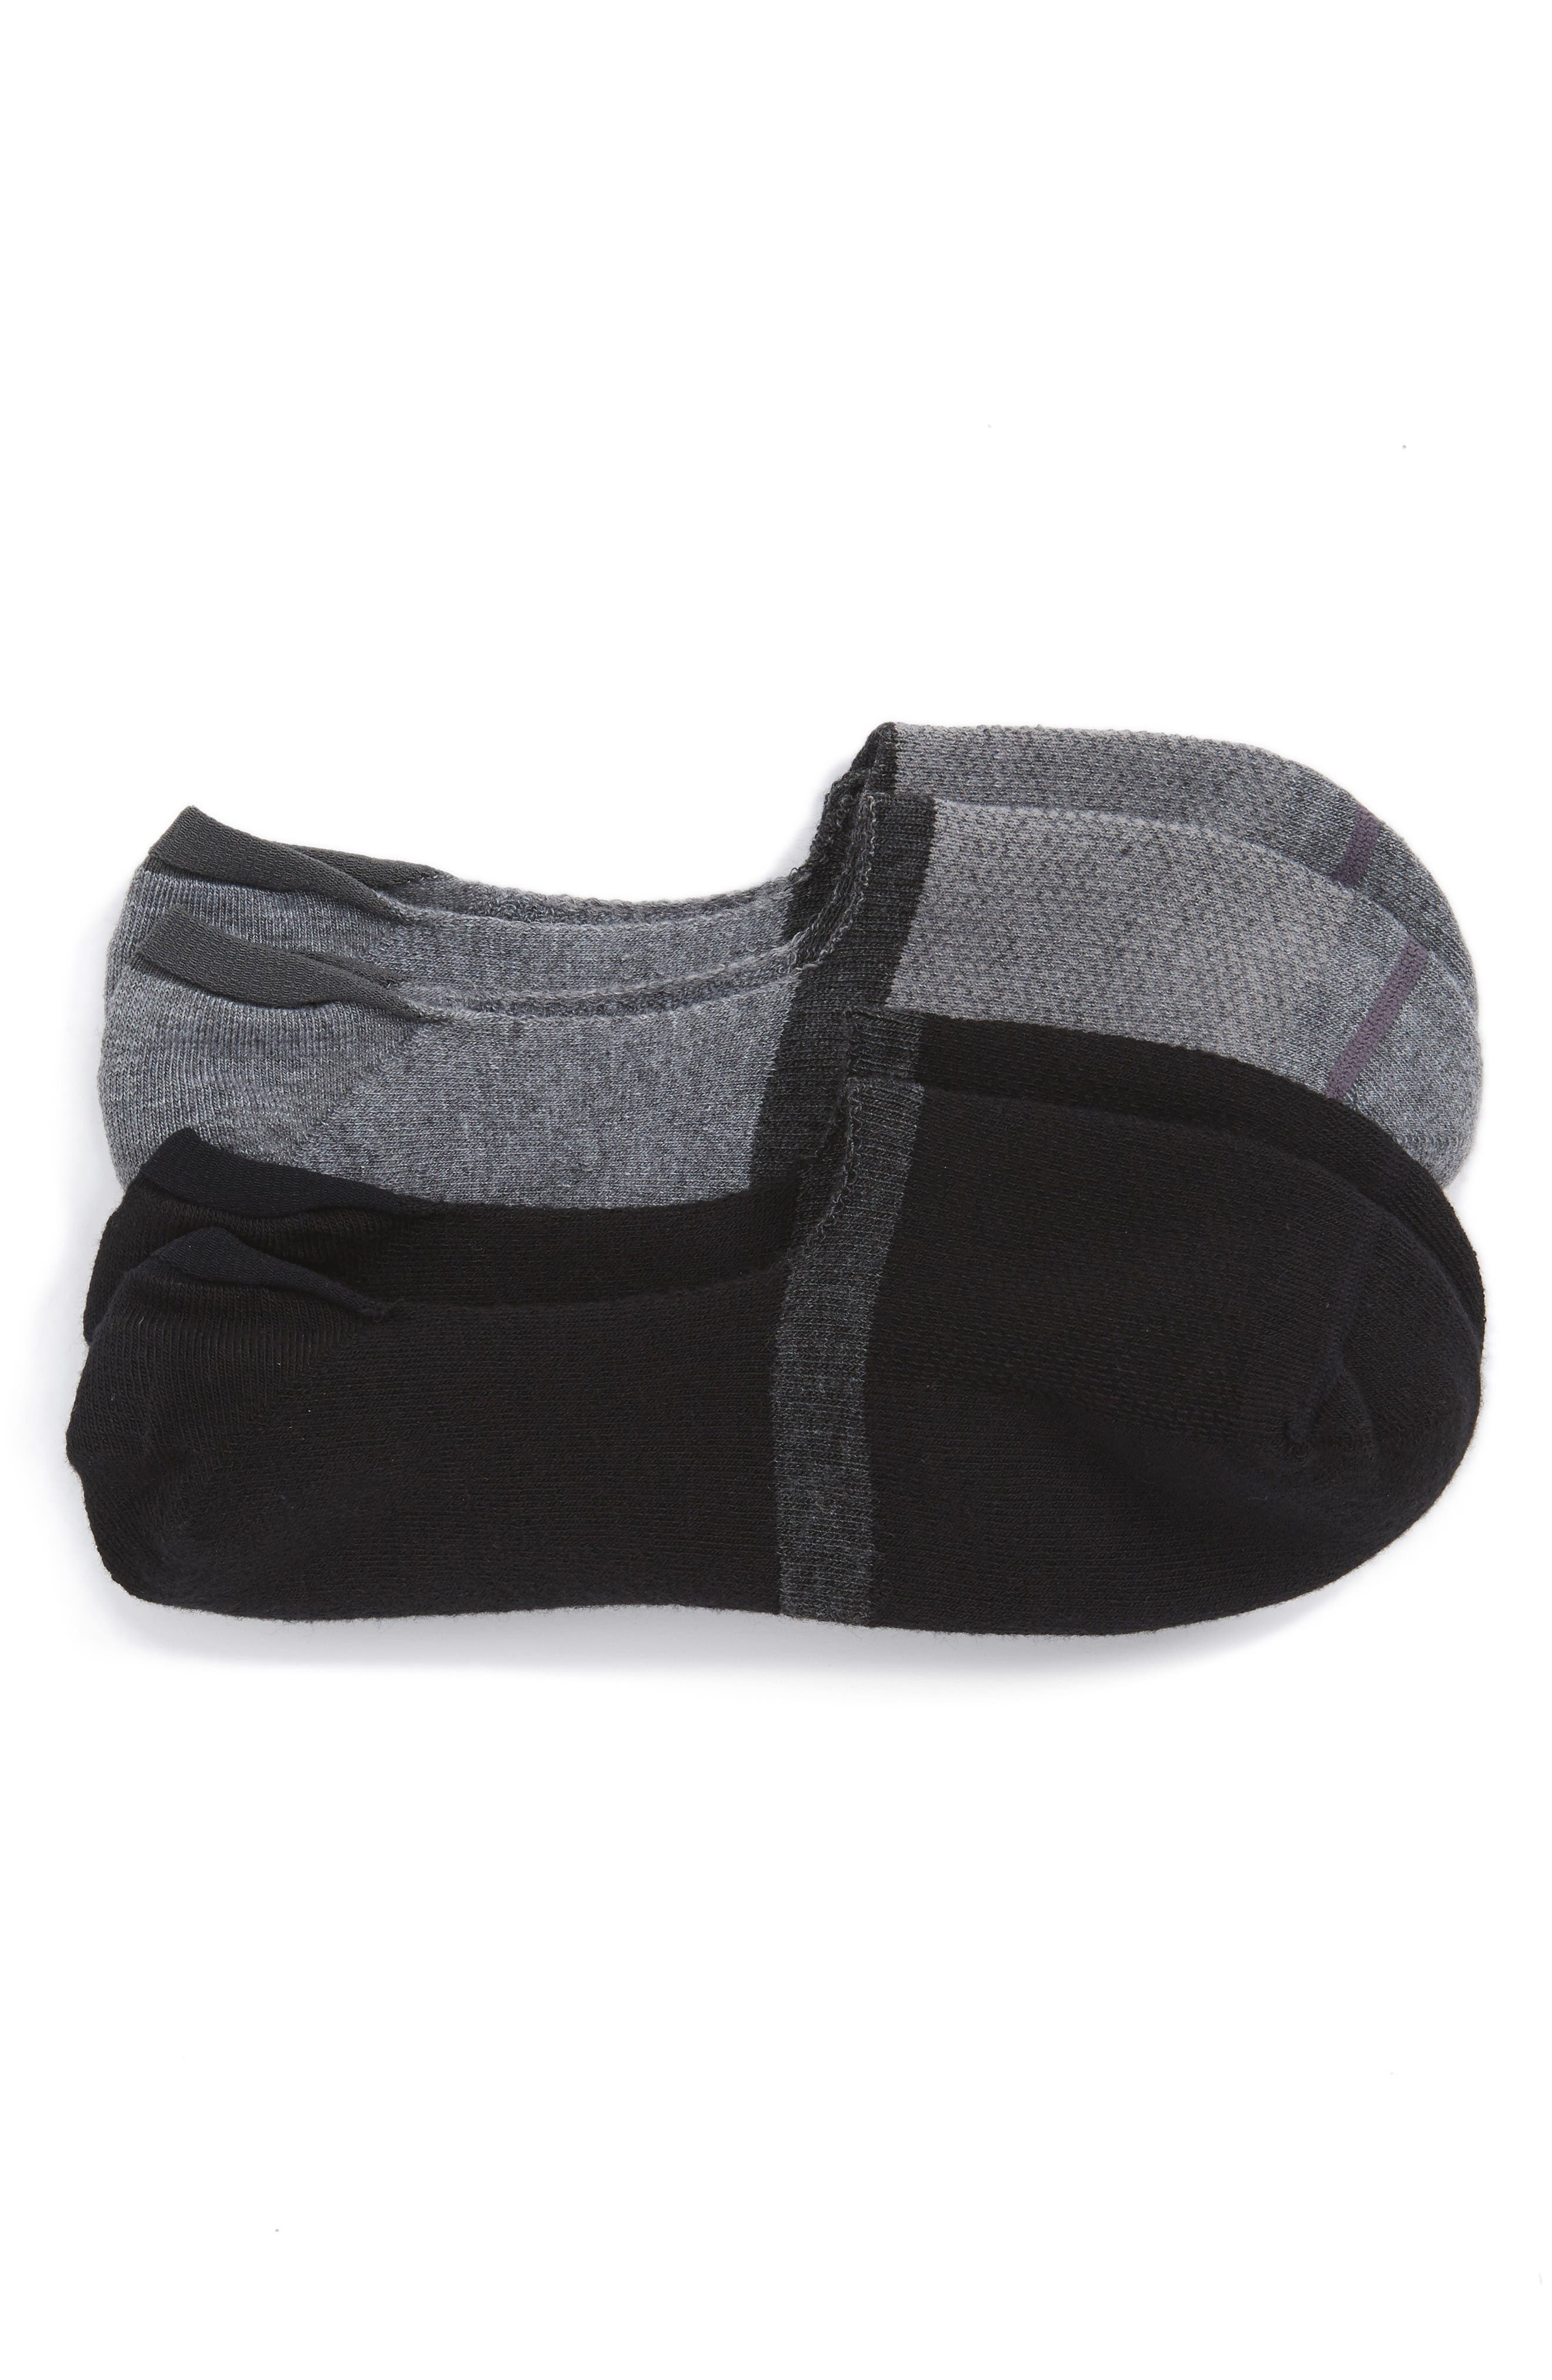 Alternate Image 1 Selected - Nordstrom Men's Shop 2-Pack Performance Liner Socks (3 for $30)